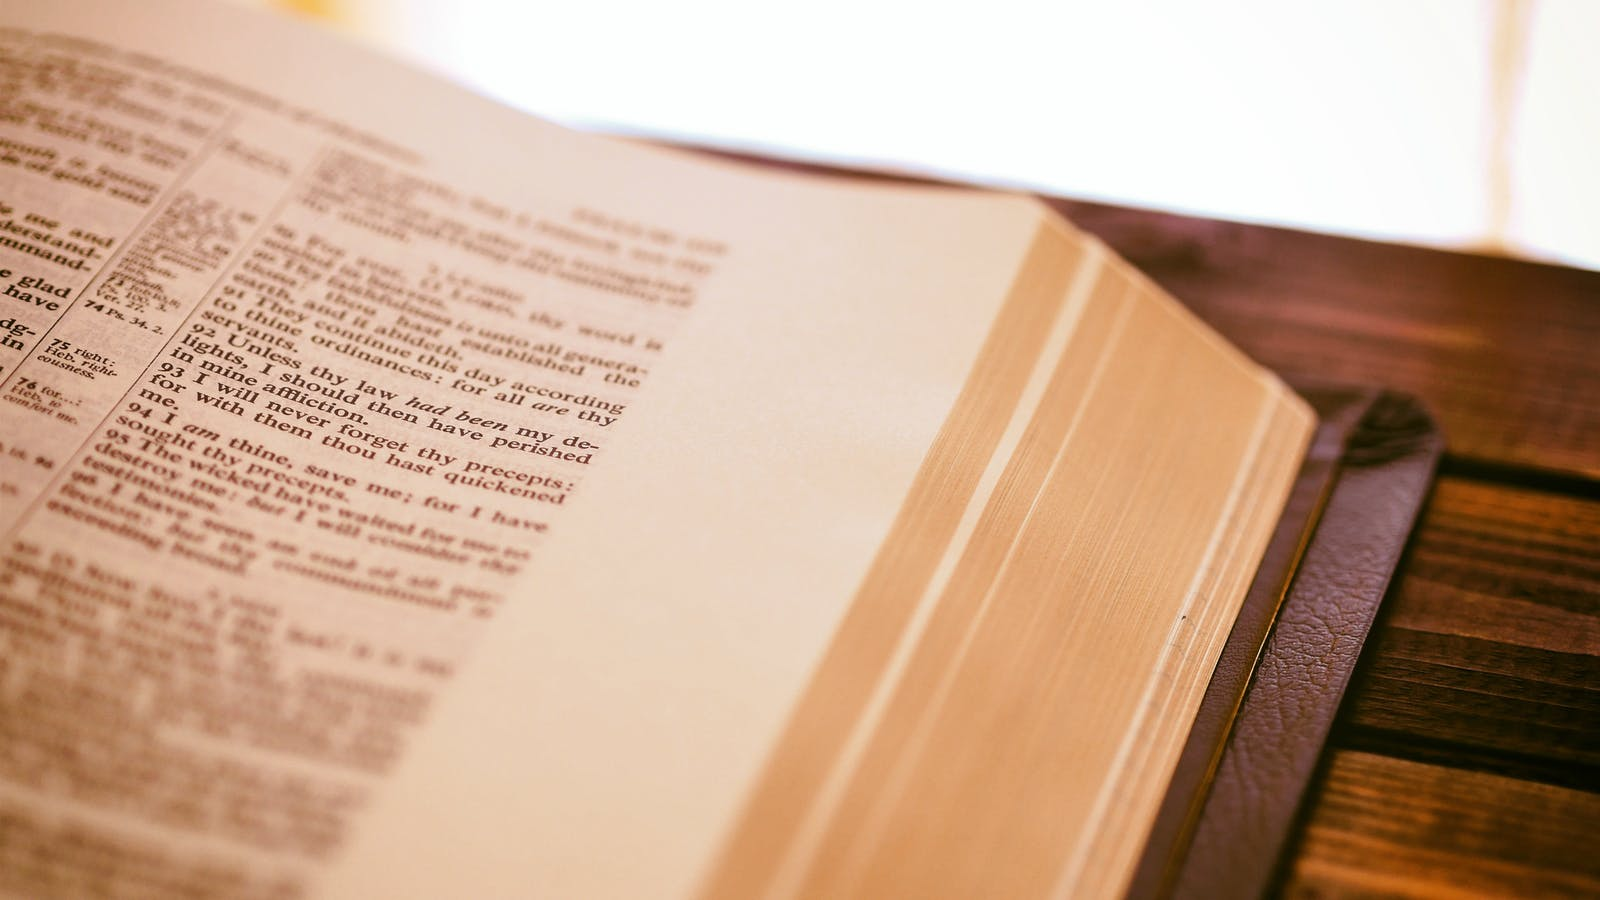 Six Common Ways Preachers Dishonor God's Word | Desiring God